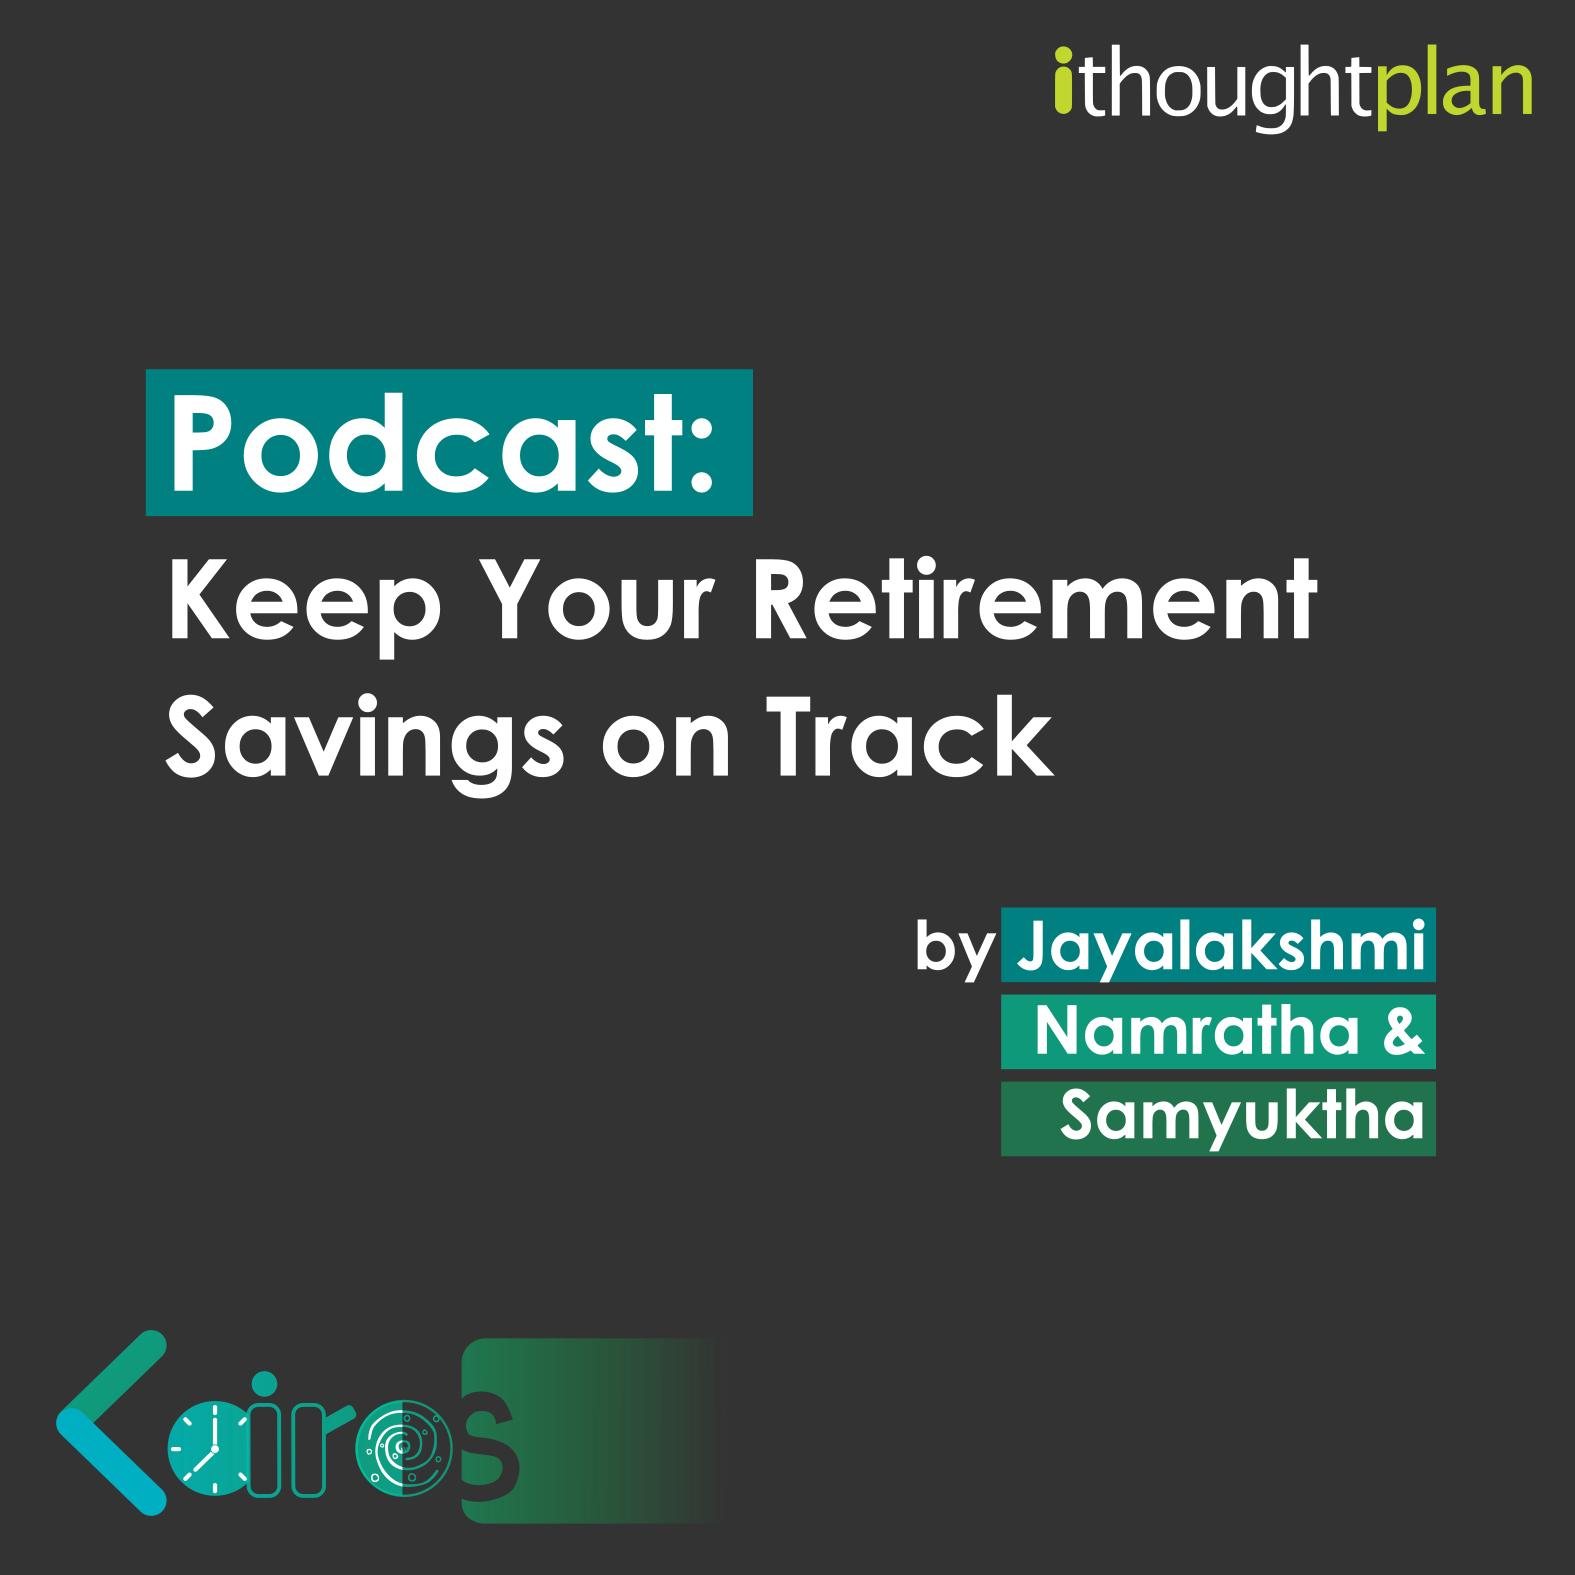 keep-your-retirement-savings-on-track-ithoughtplan-kairos-podcast